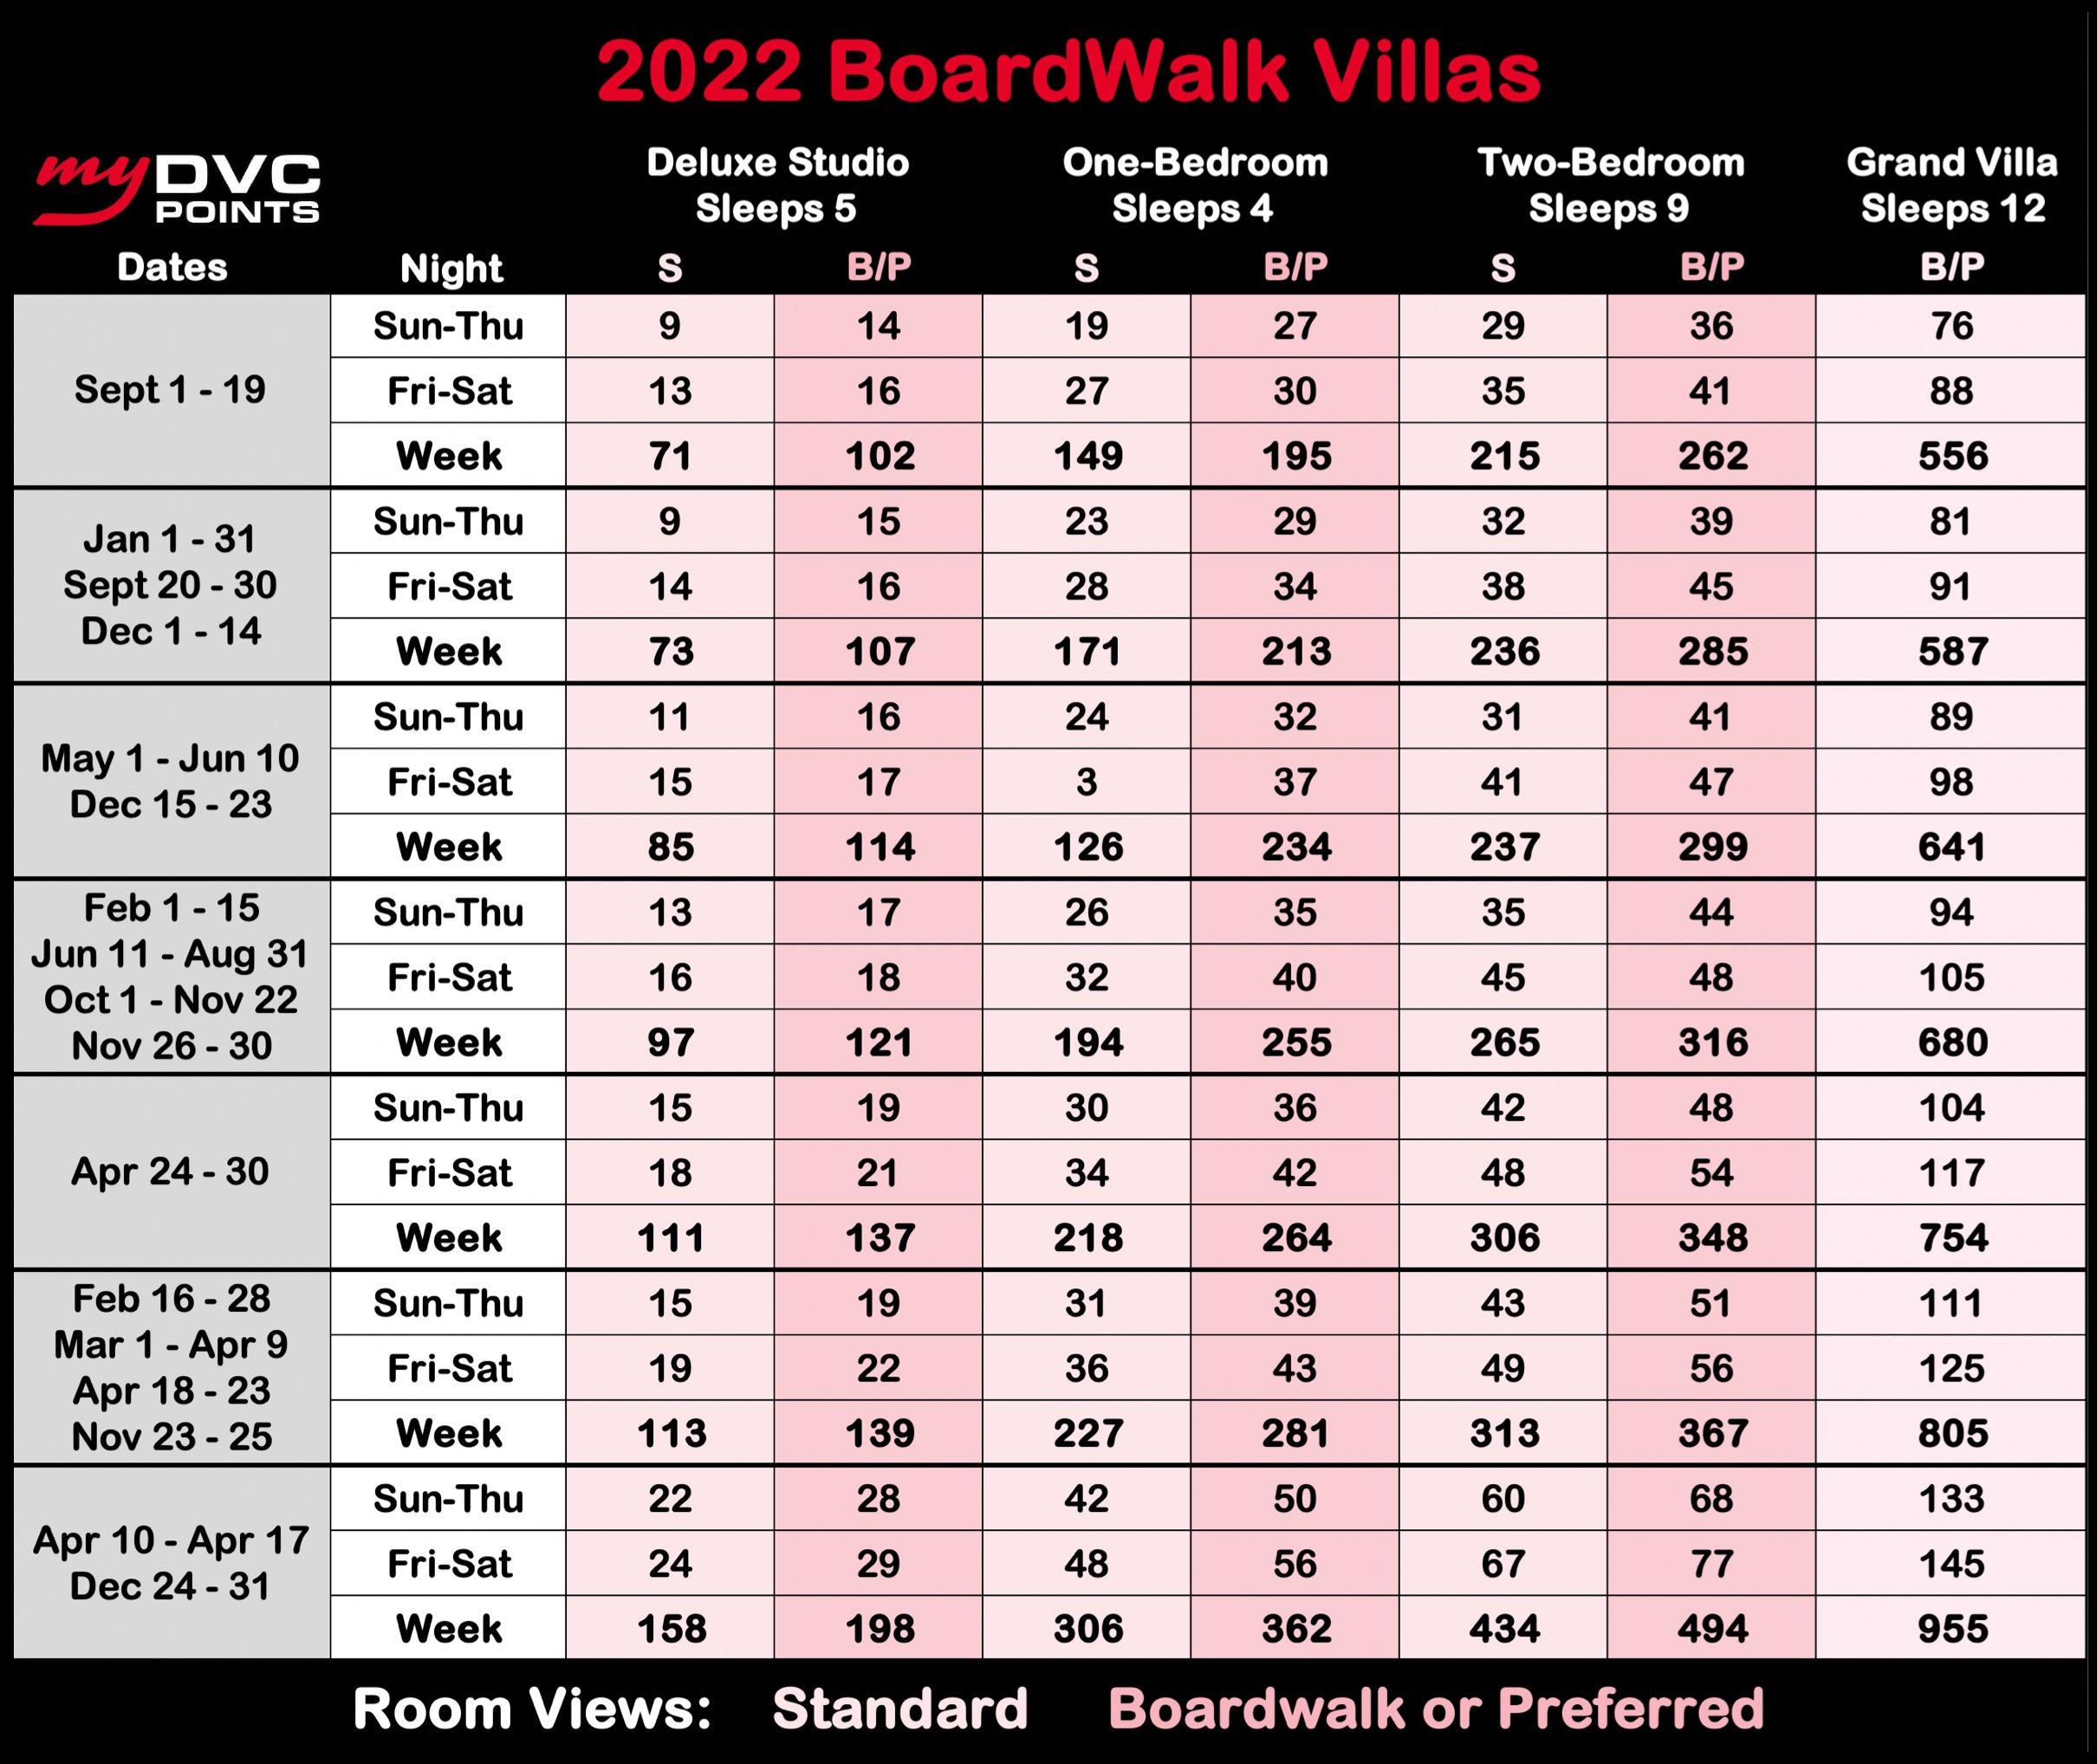 Disney's BoardWalk Villas 2022 Point Charts